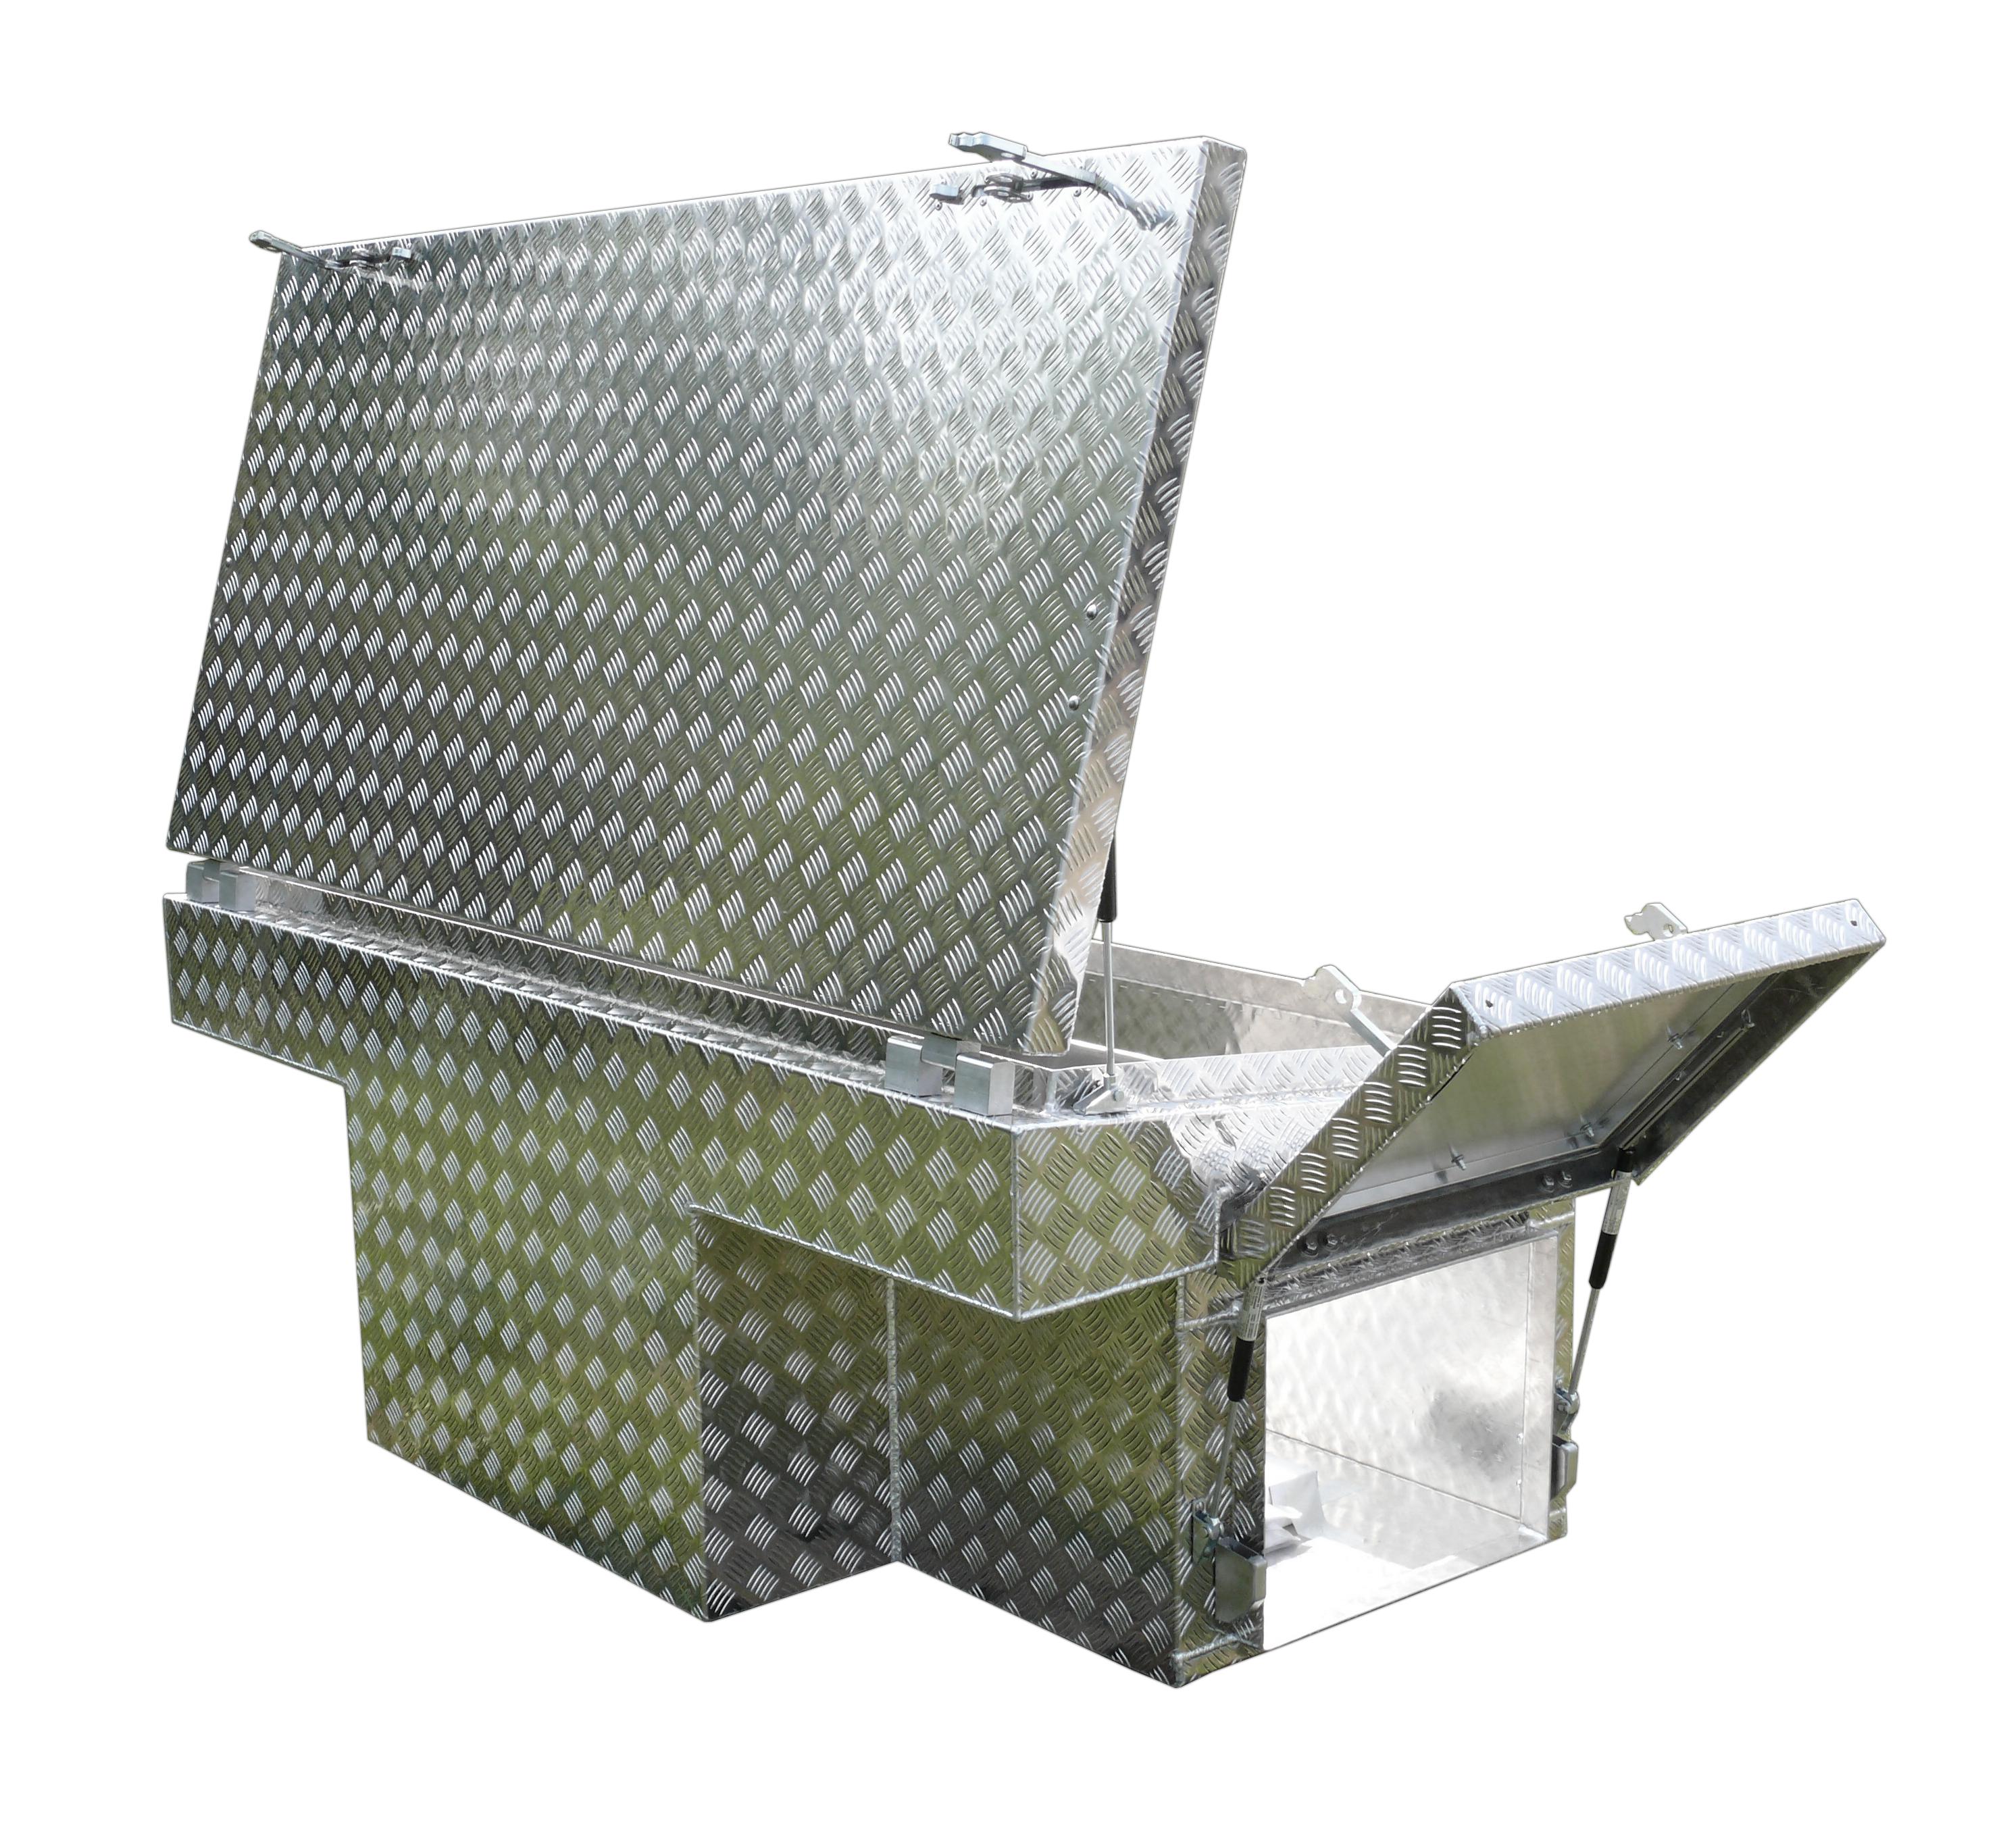 spezial alubox brossbox. Black Bedroom Furniture Sets. Home Design Ideas